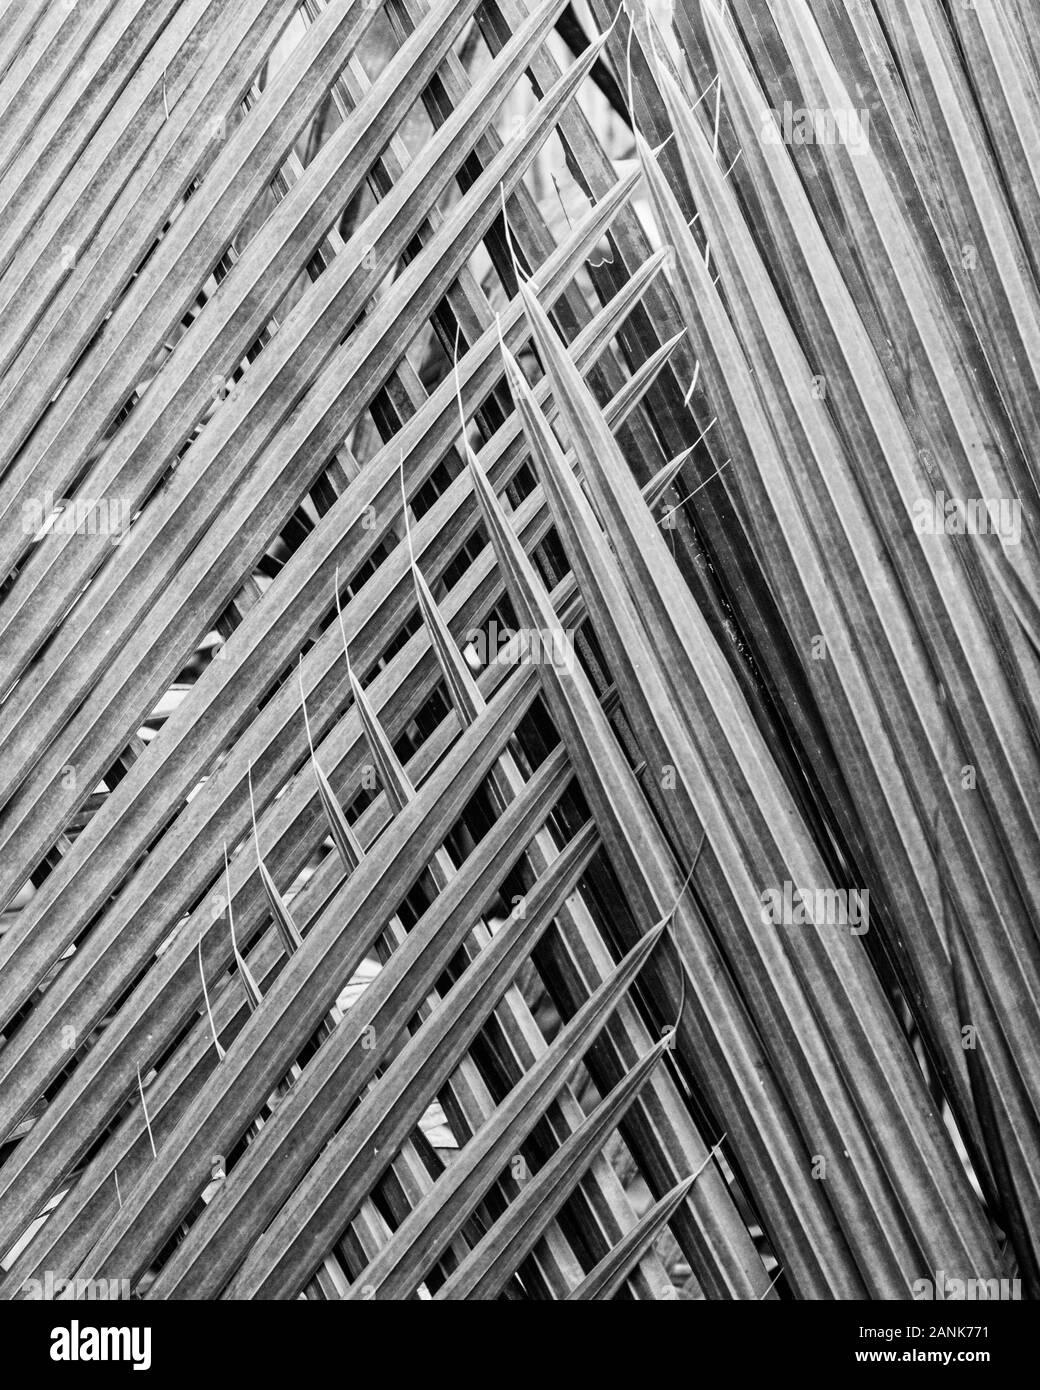 Abstracto geométrico fromed por frondas de palma. Foto de stock